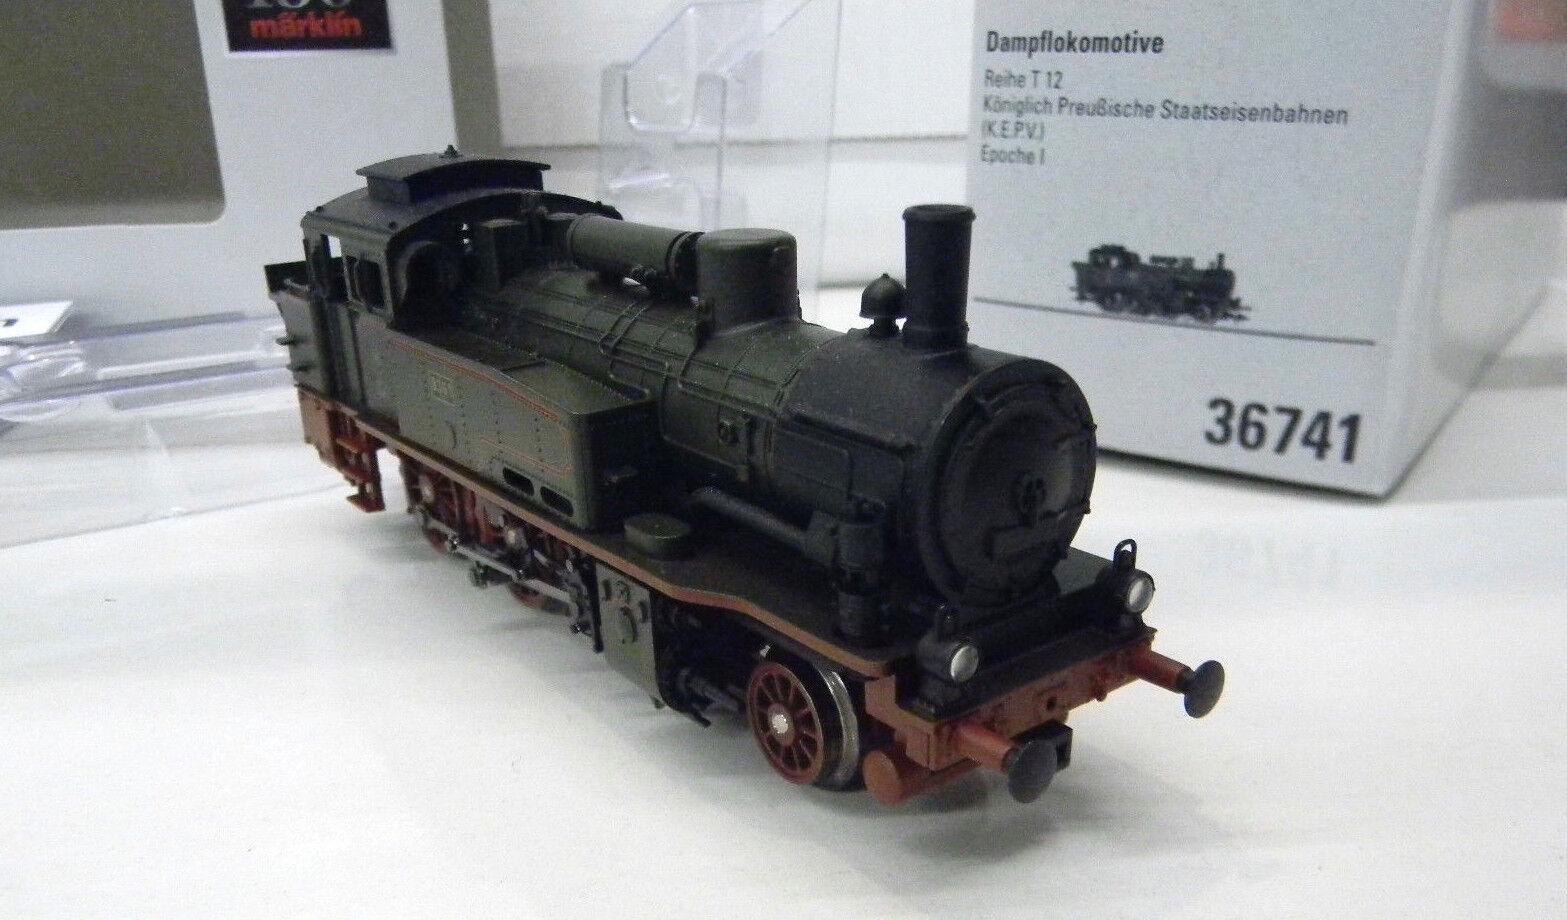 36741 Märklin Dampflok T12 KPEV Epoche I - H0 HO 1 87 Eisenbahn modeltrain loco  | Hohe Qualität